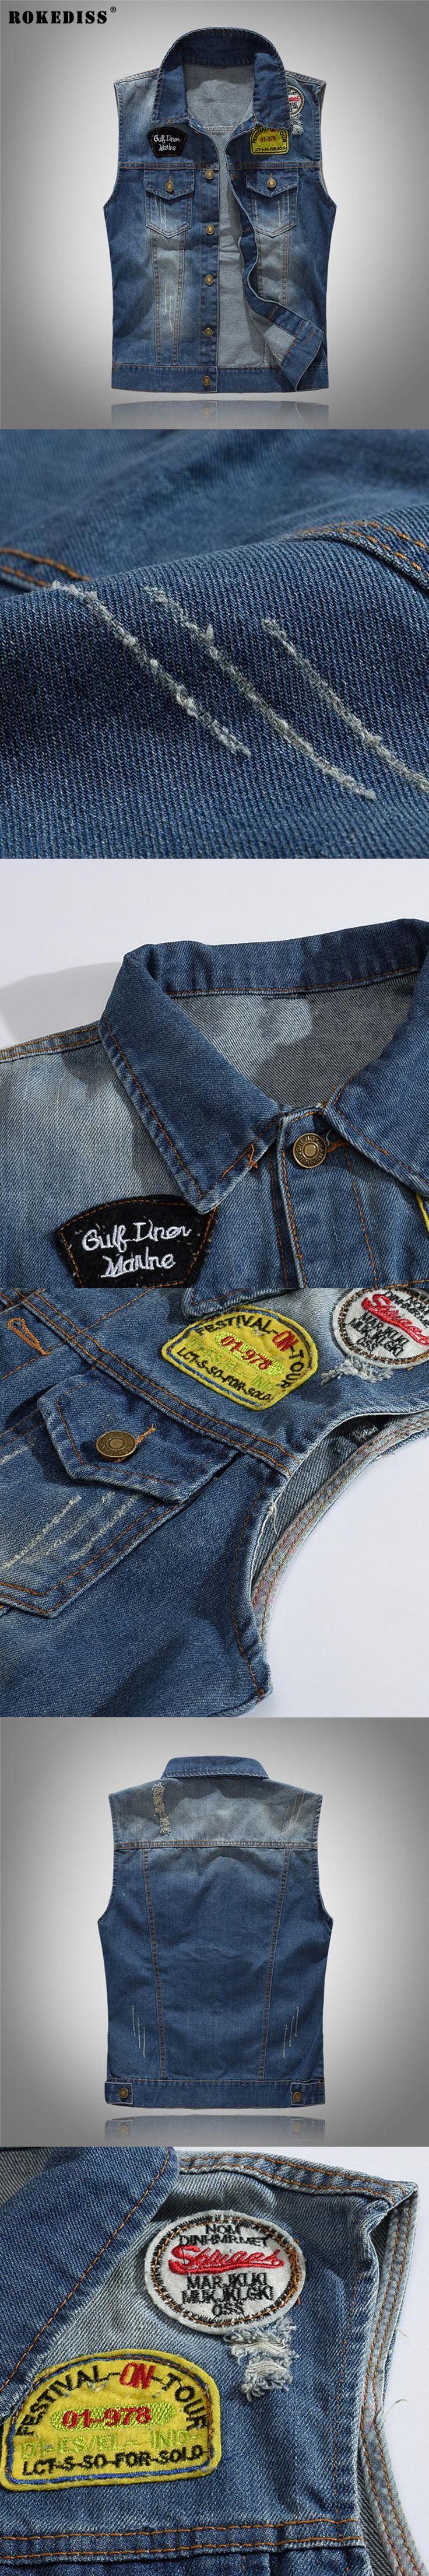 ROKEDISS 2017 Fashion Mens Motorcycle Jean Vest Dark Blue badge Washed Slim Fit Sleeveless Denim Jacket For Men W110